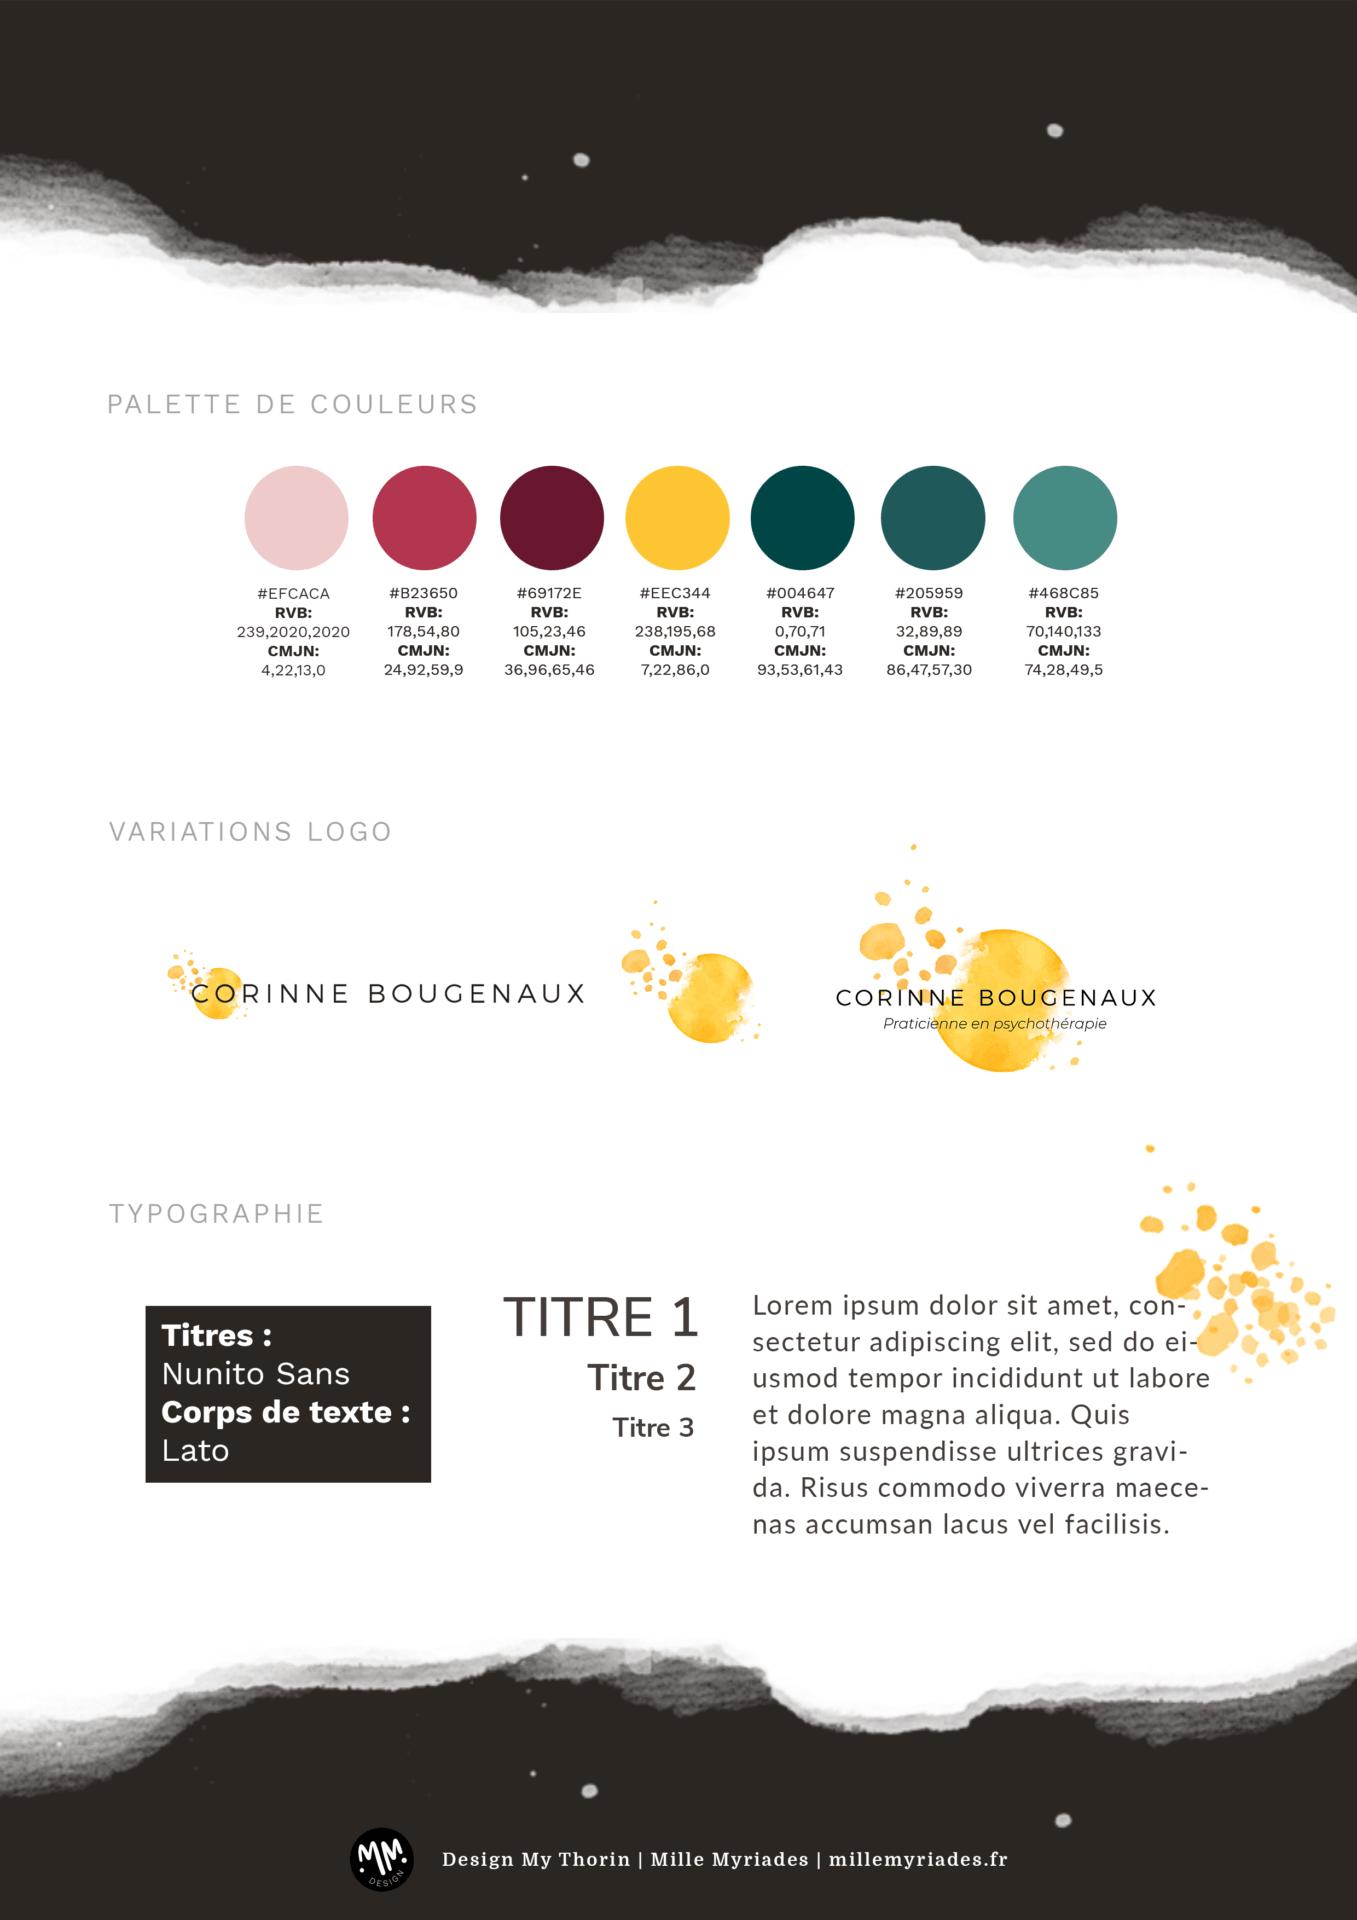 Corinne Bougenaux Idenitité visuelle - Brandboard couleurs